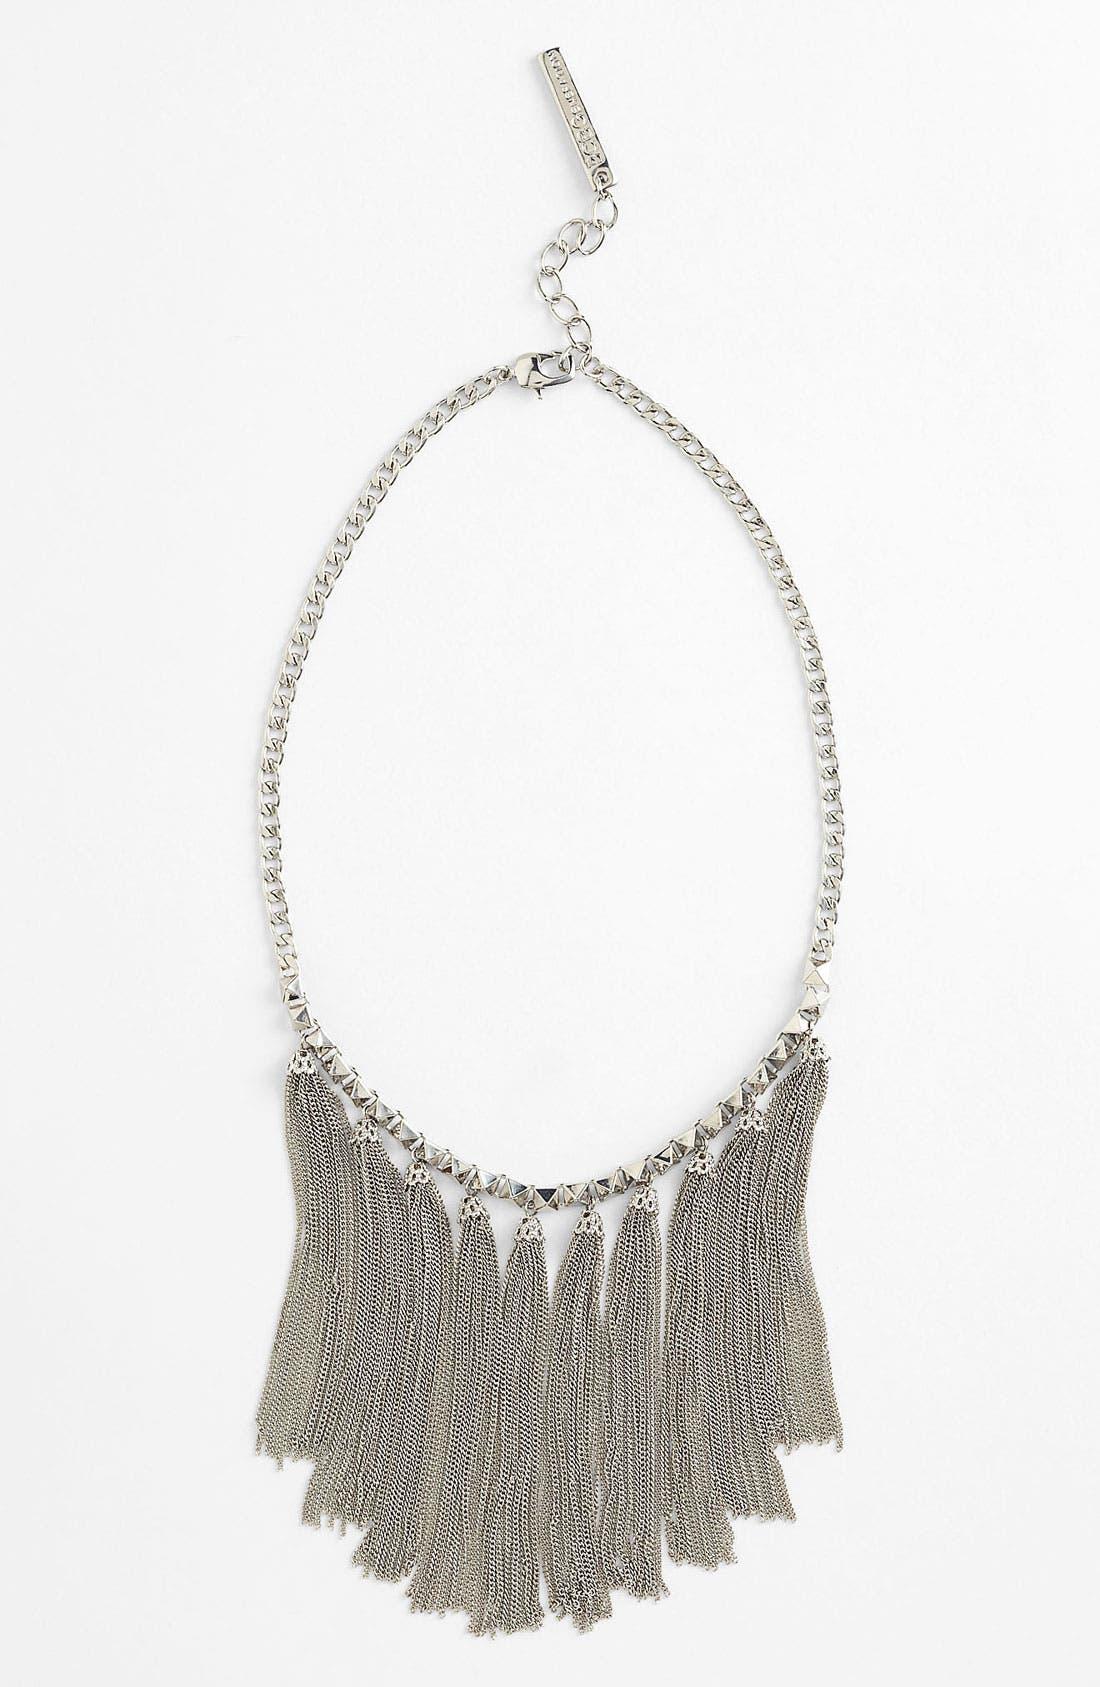 Main Image - BCBGeneration 'The Standard' Tassel Necklace